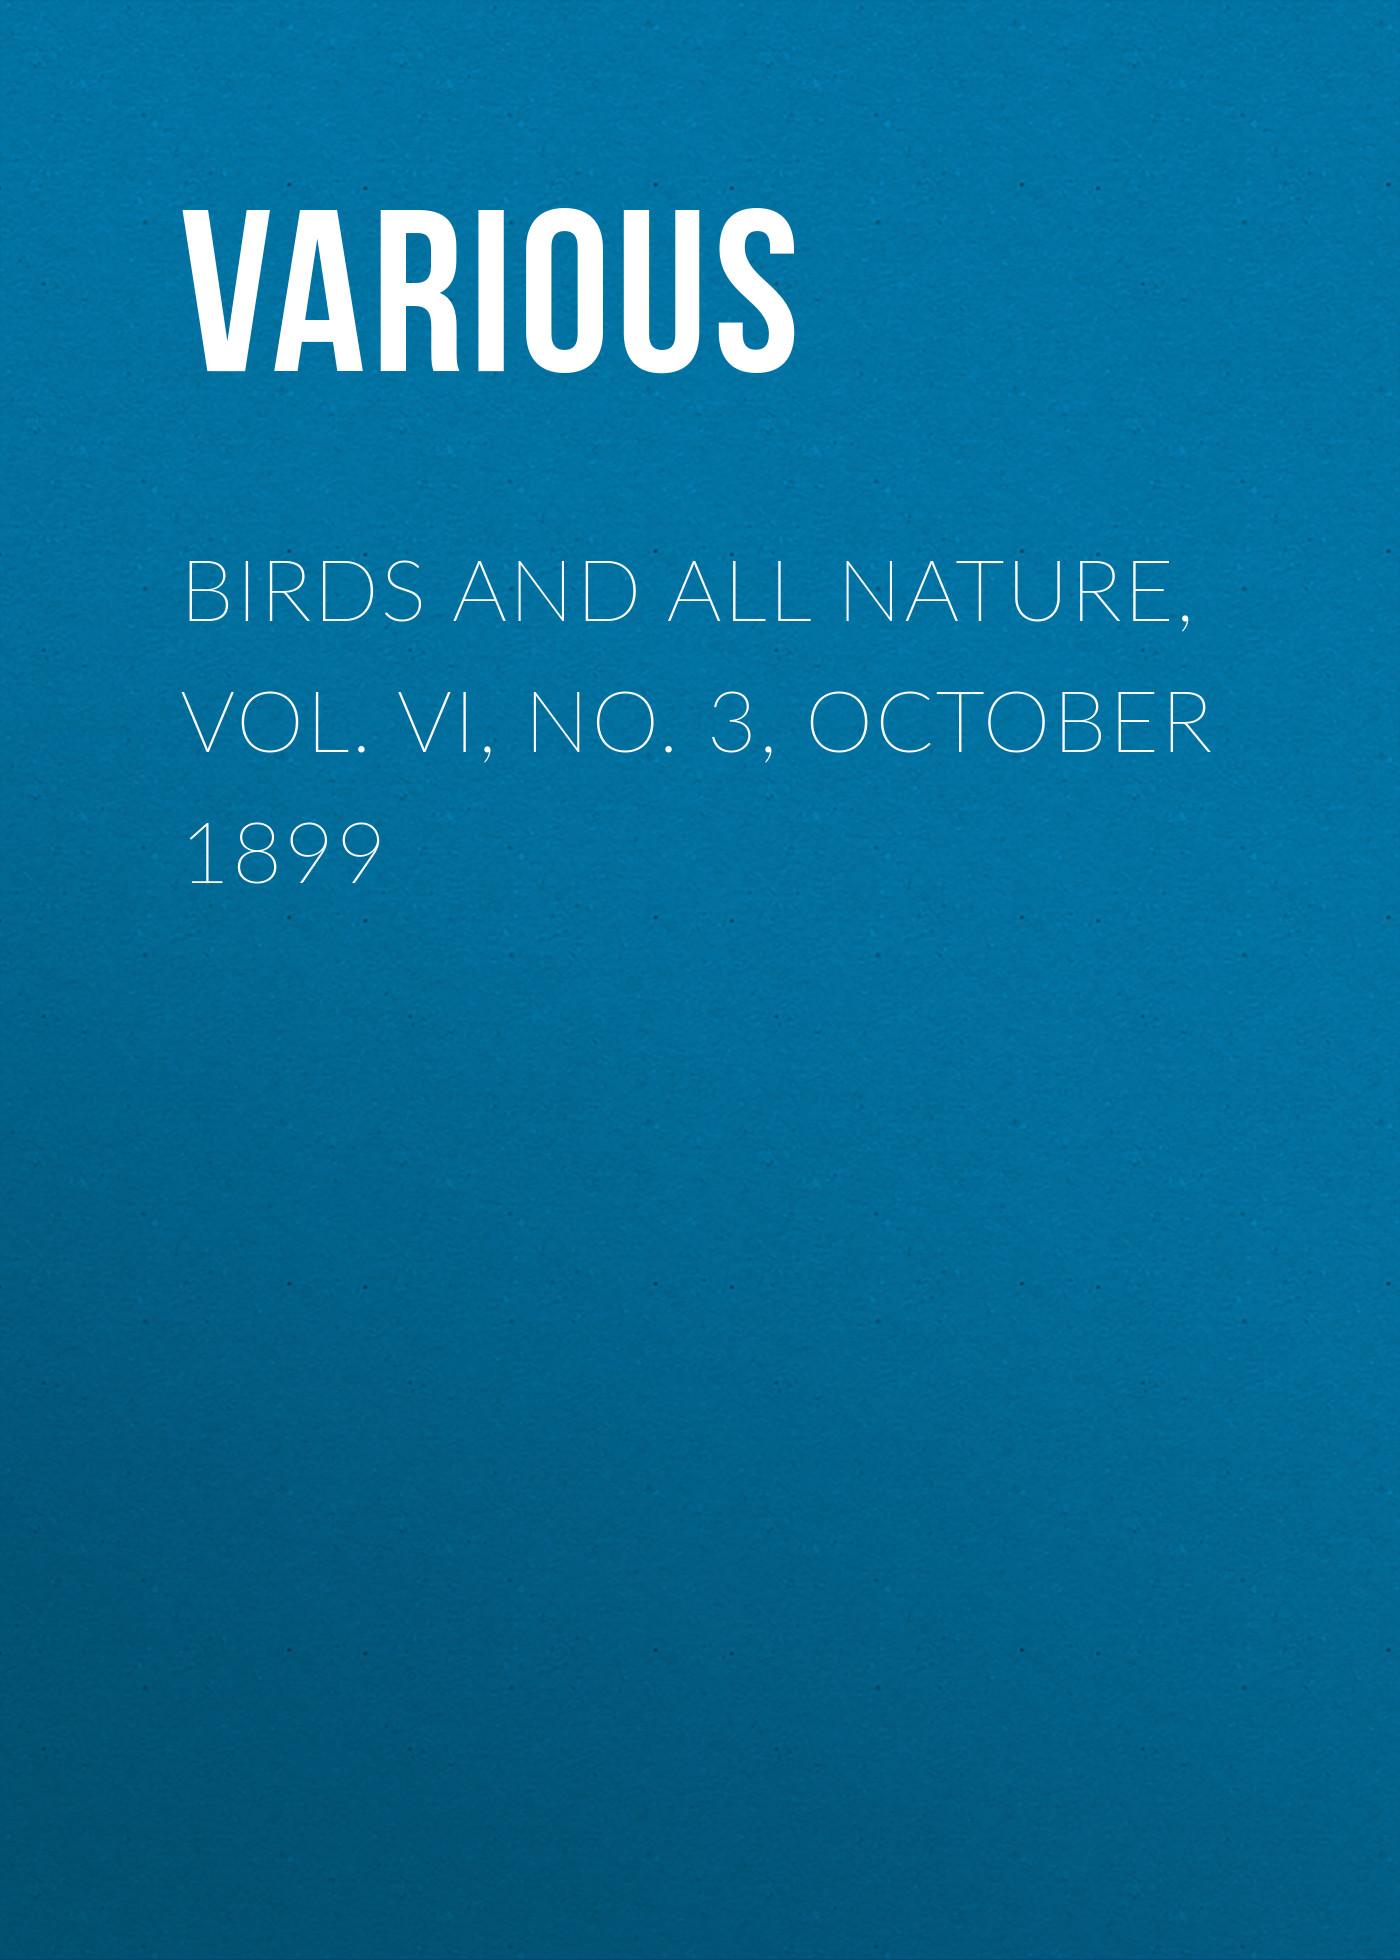 Various Birds and All Nature, Vol. VI, No. 3, October 1899 various birds and all nature vol v no 1 january 1899